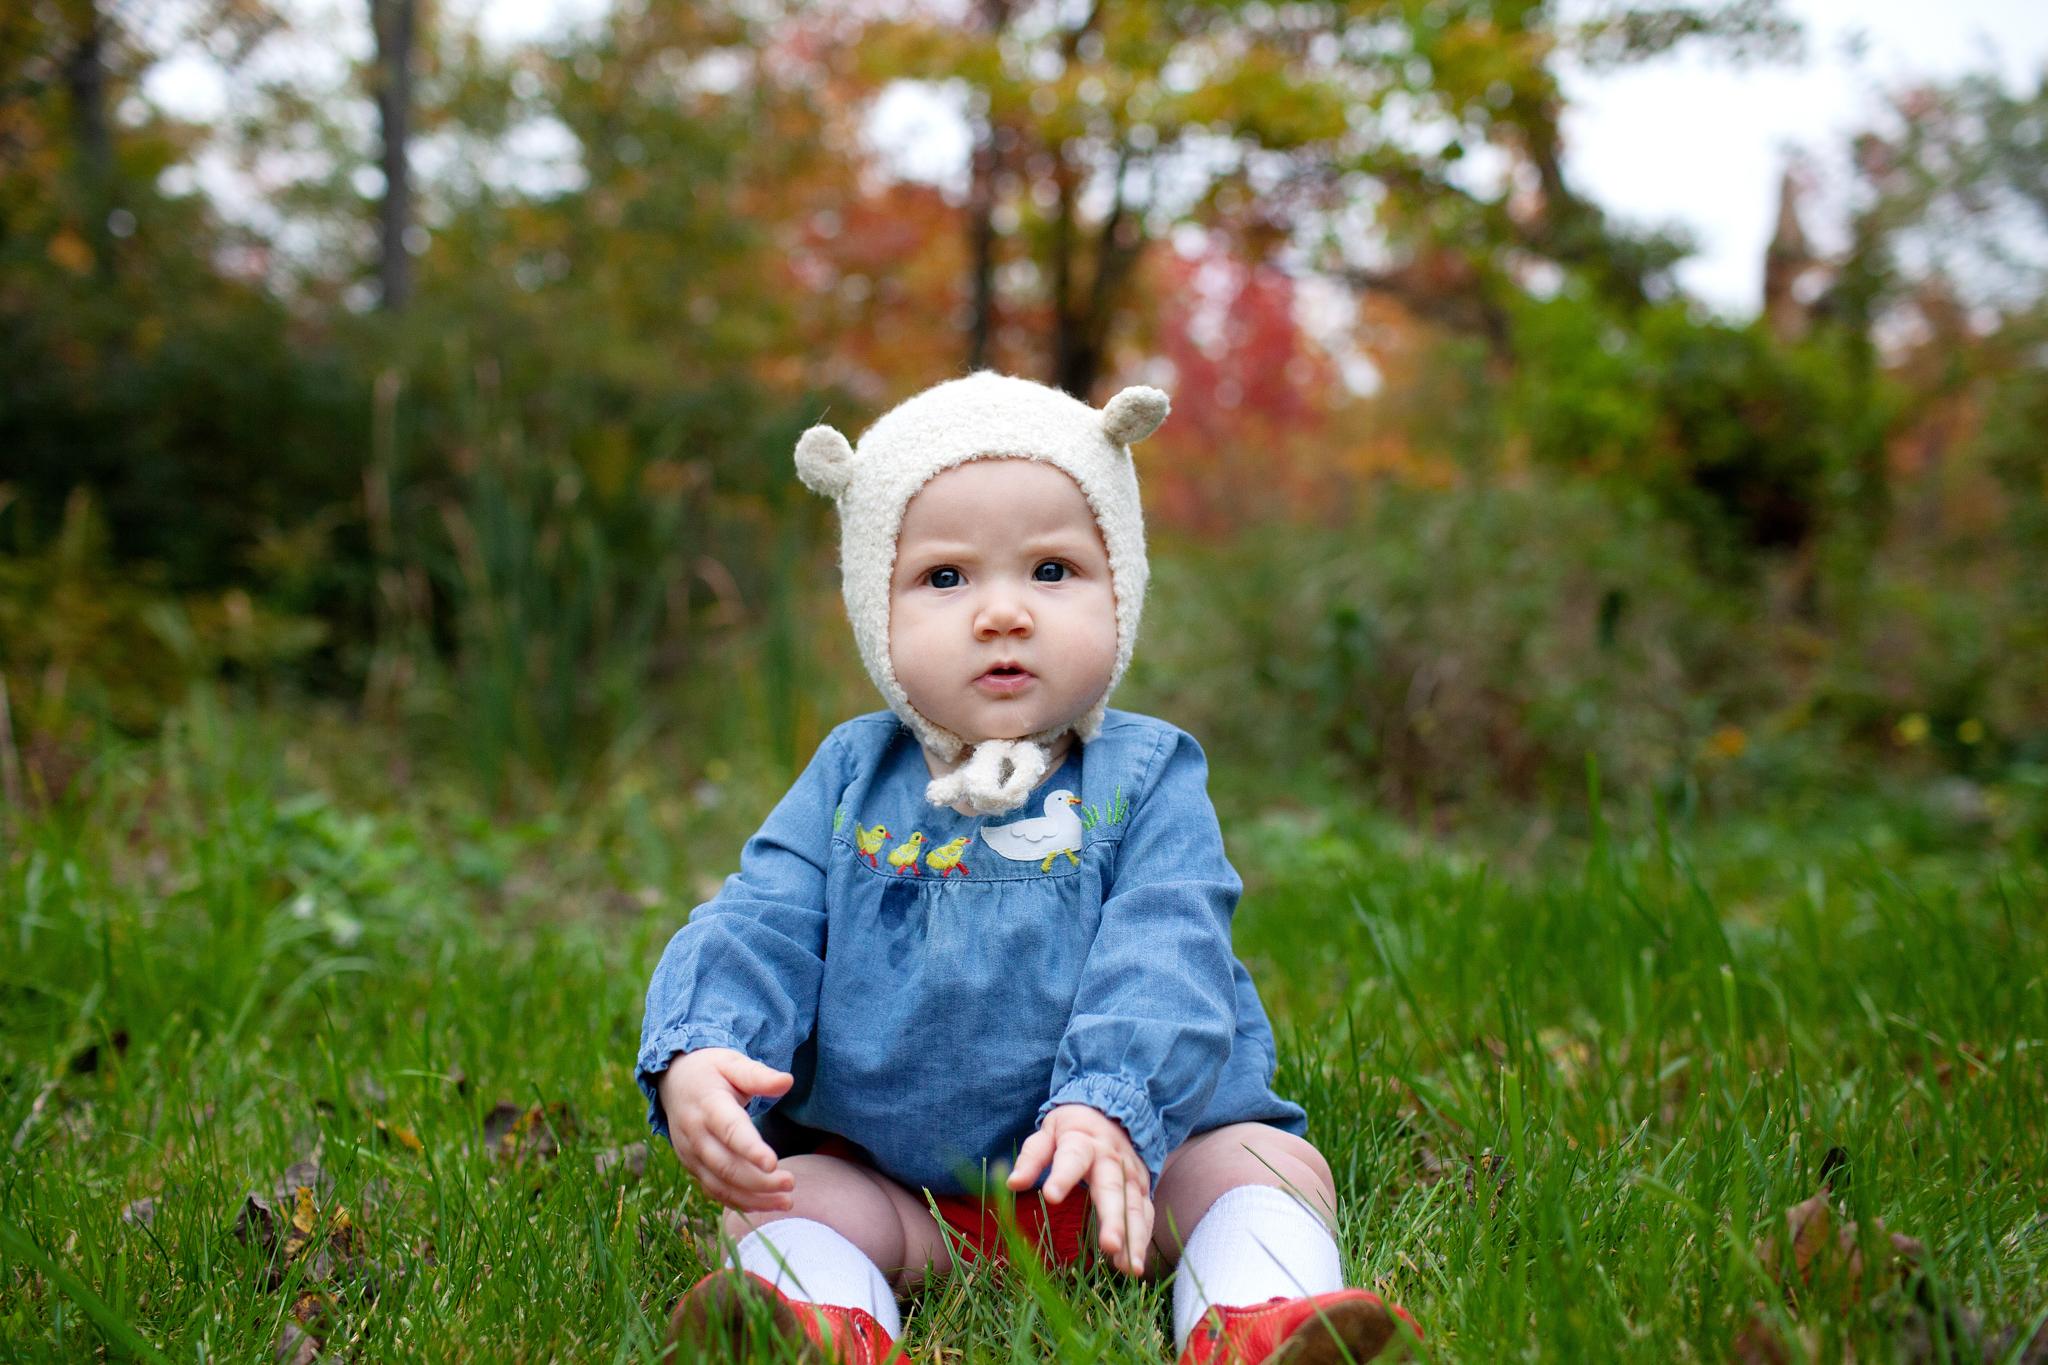 maine-baby-milestone-photographer-stepheney-collins-photography -33.jpg